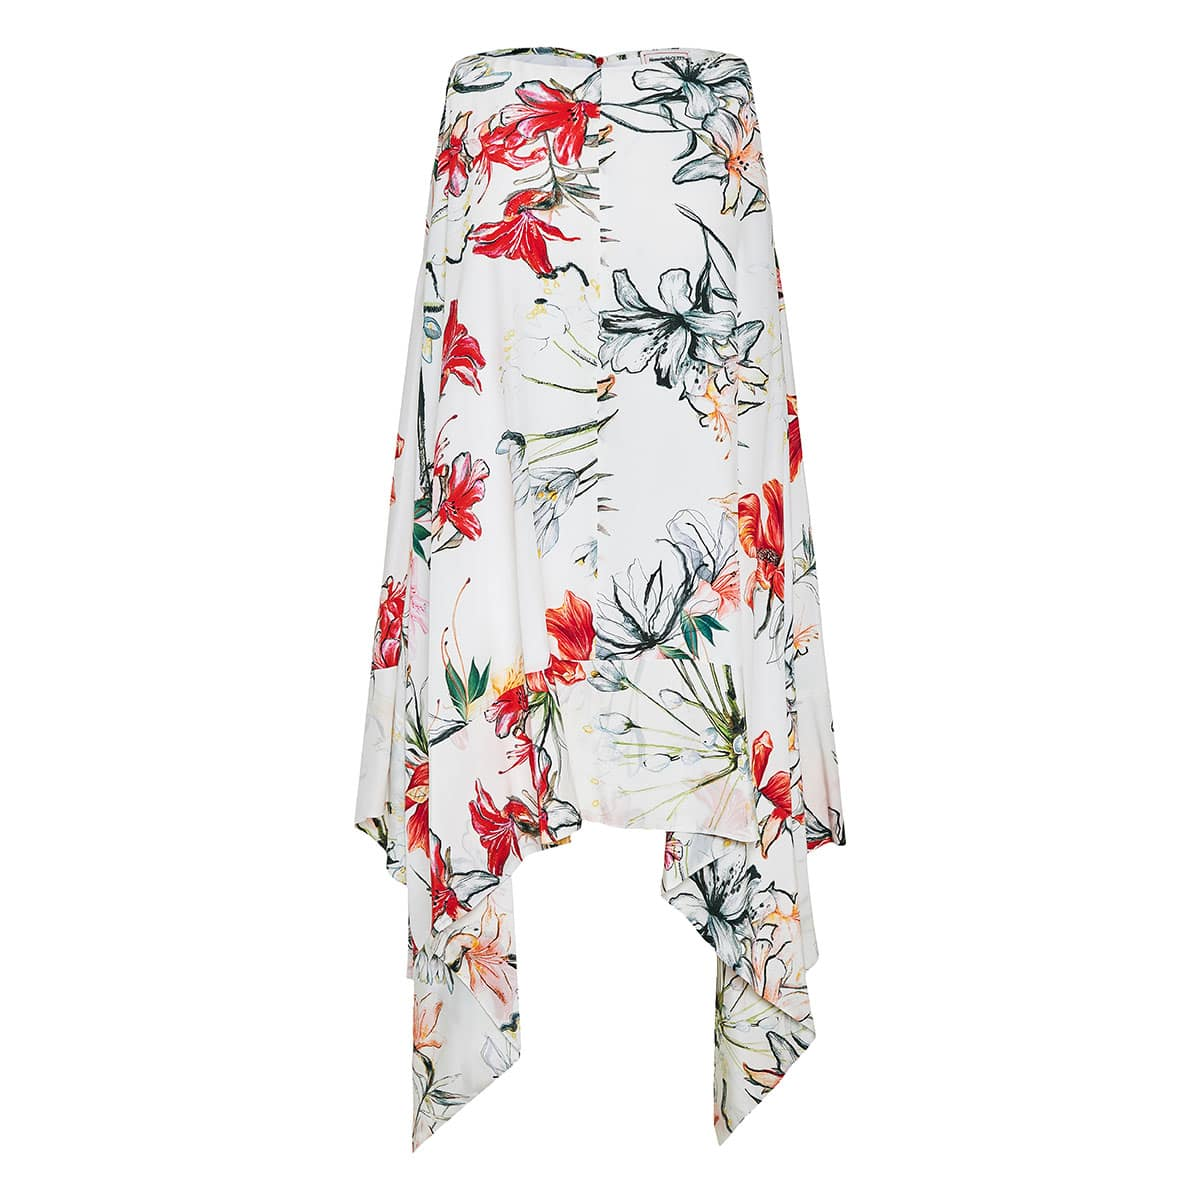 Asymmetric floral silk dress